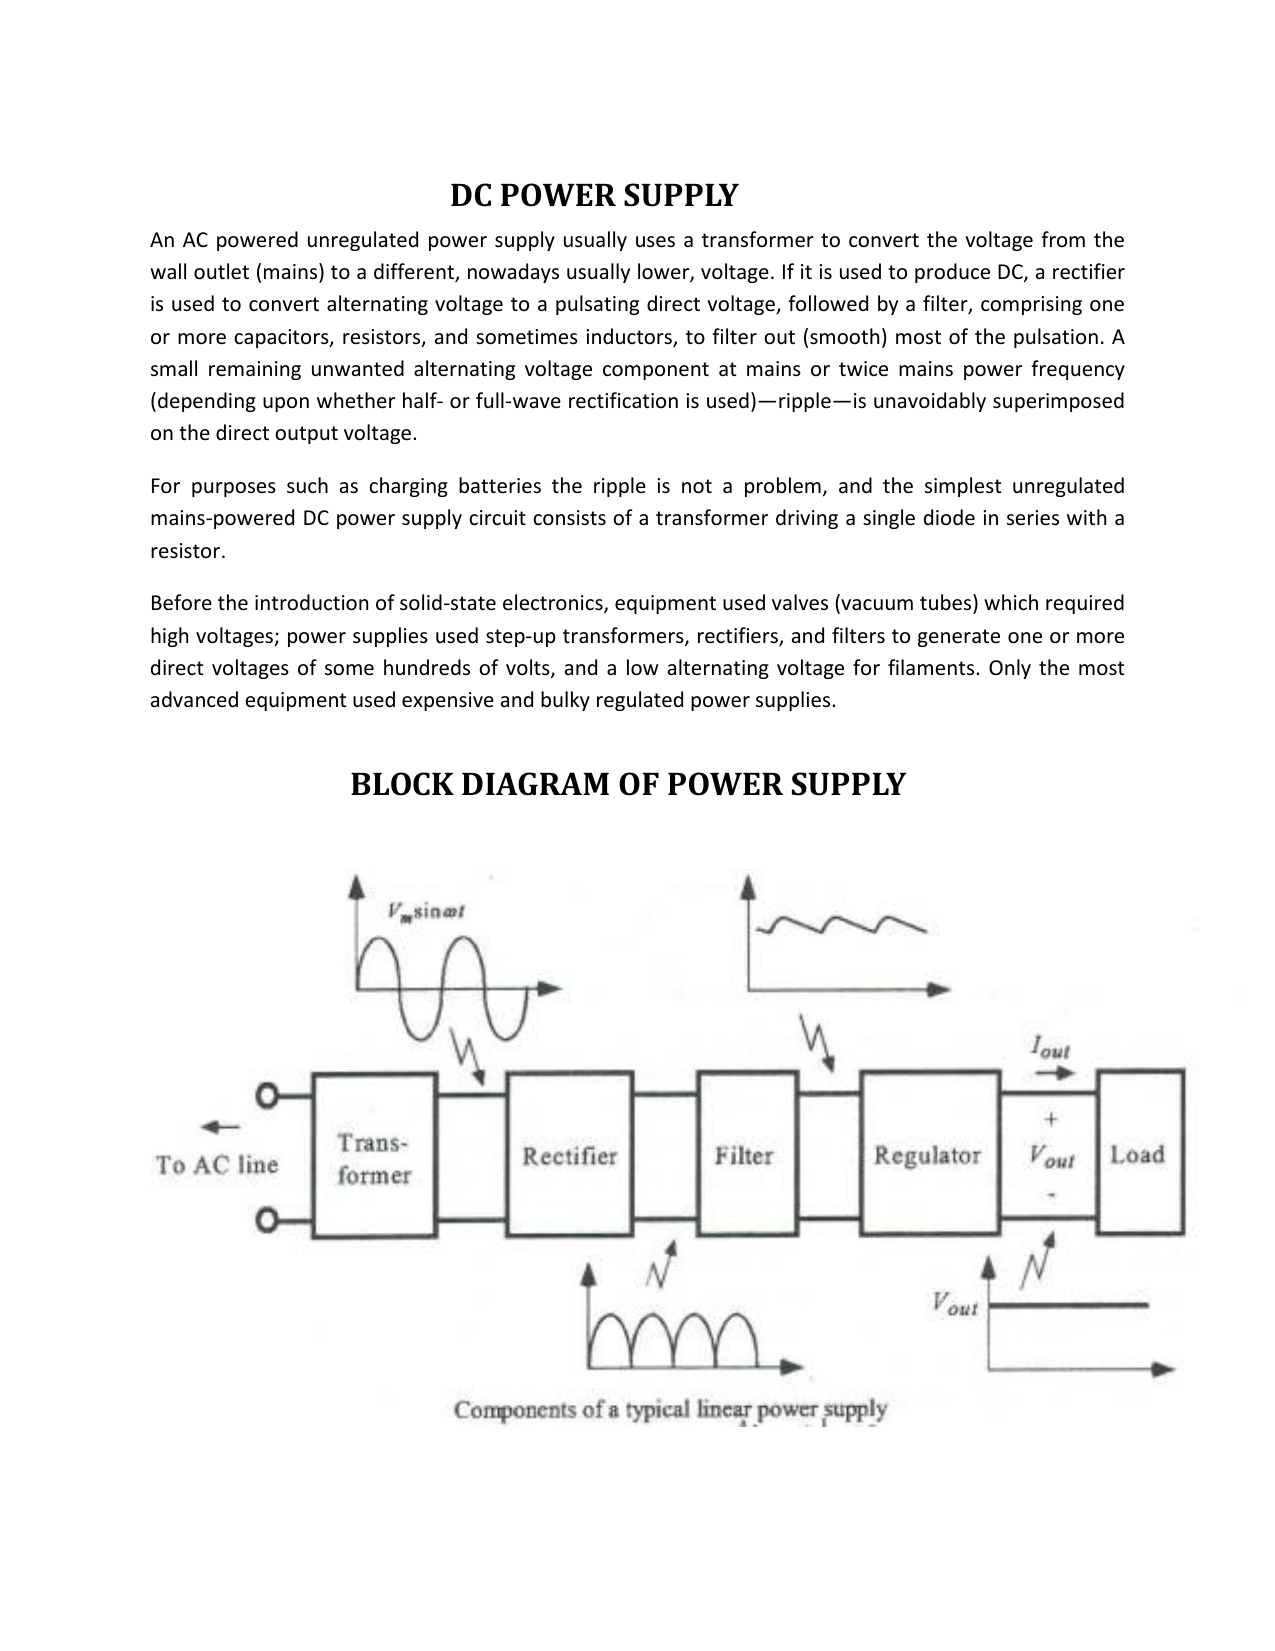 DC POWER SUPPLY BLOCK DIAGRAM OF POWER SUPPLYStudylib